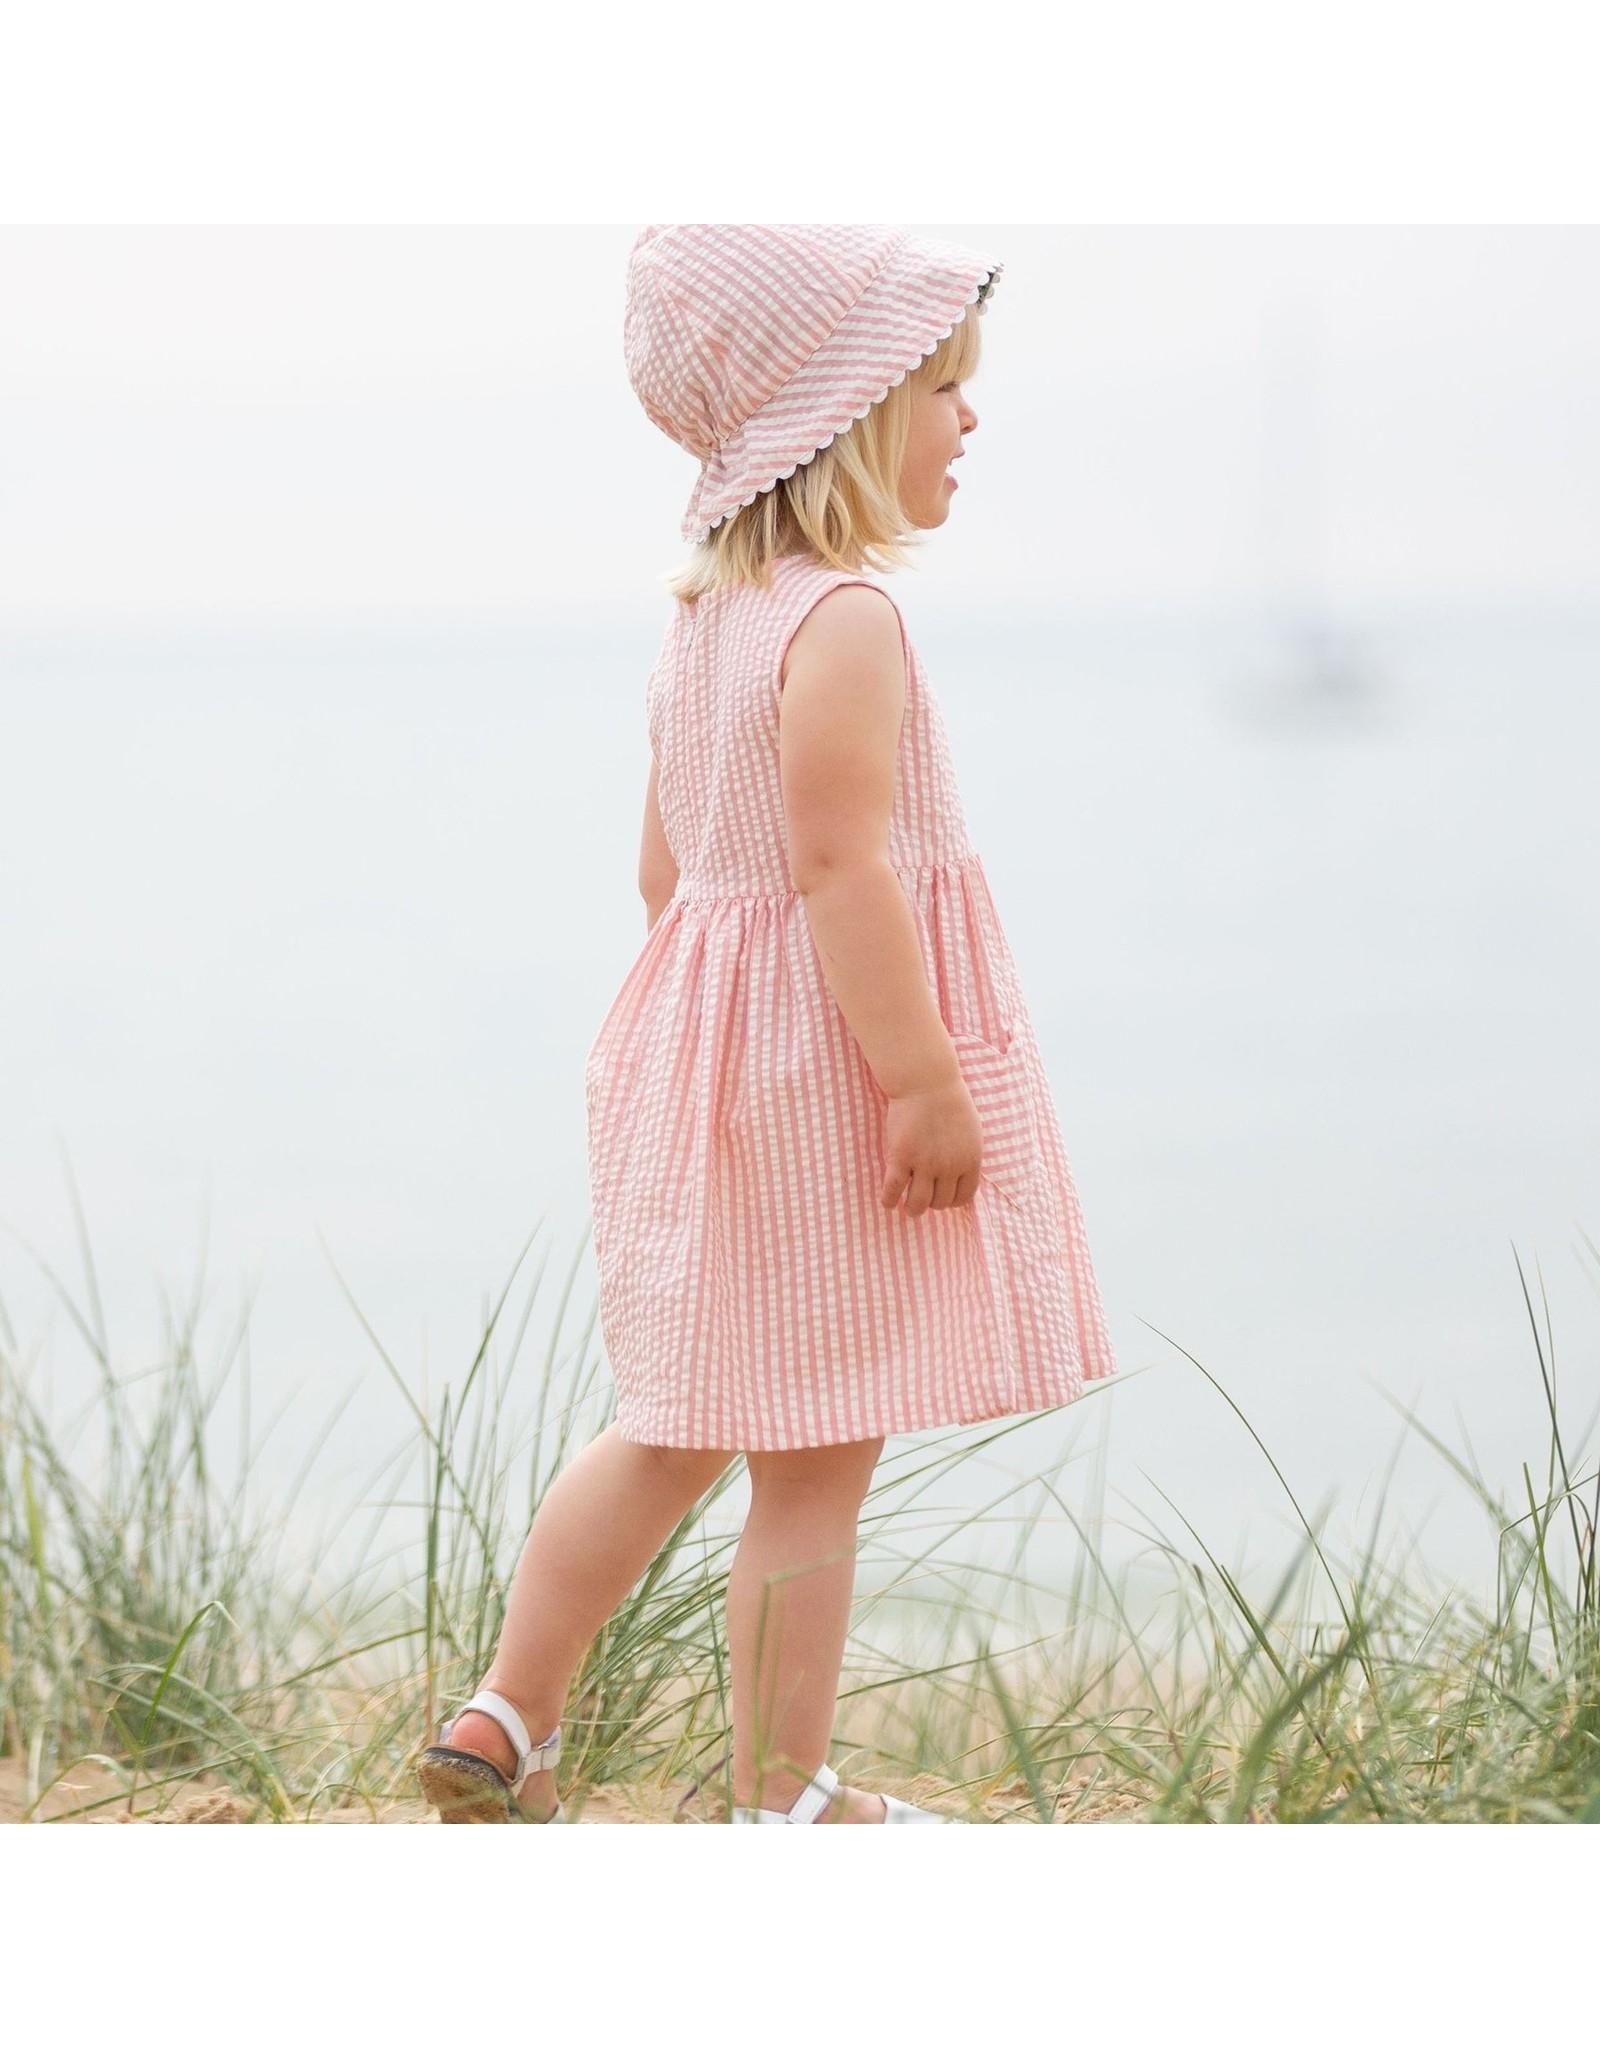 Kite Clothing Seersucker Heart Dress